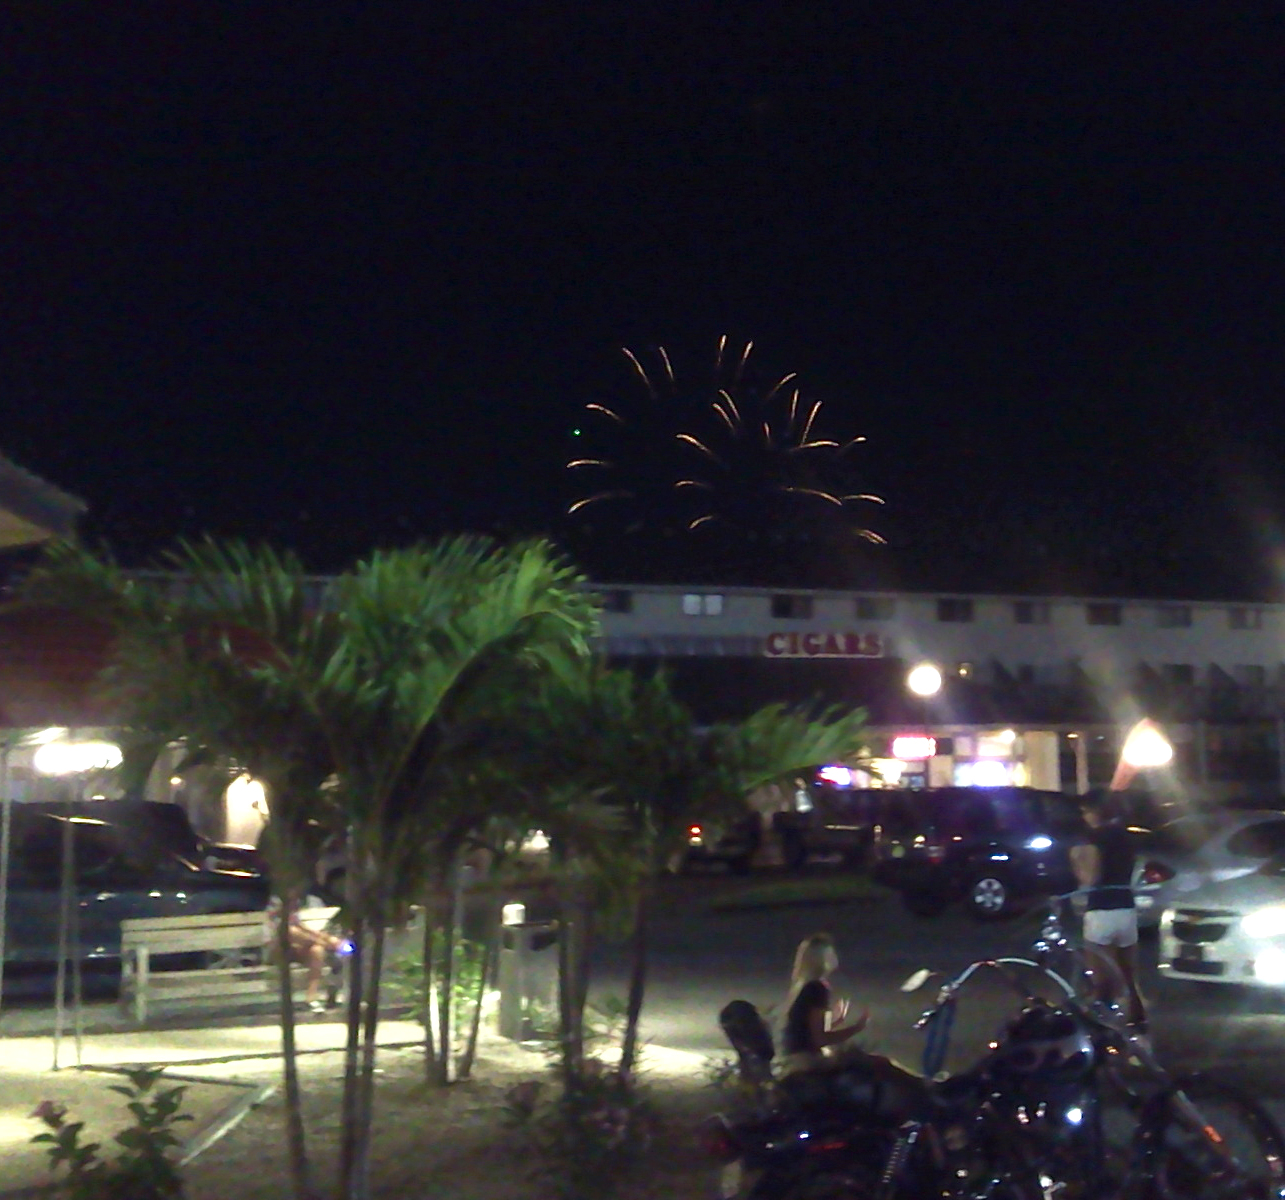 Fireworks 7/4/2013 - 2